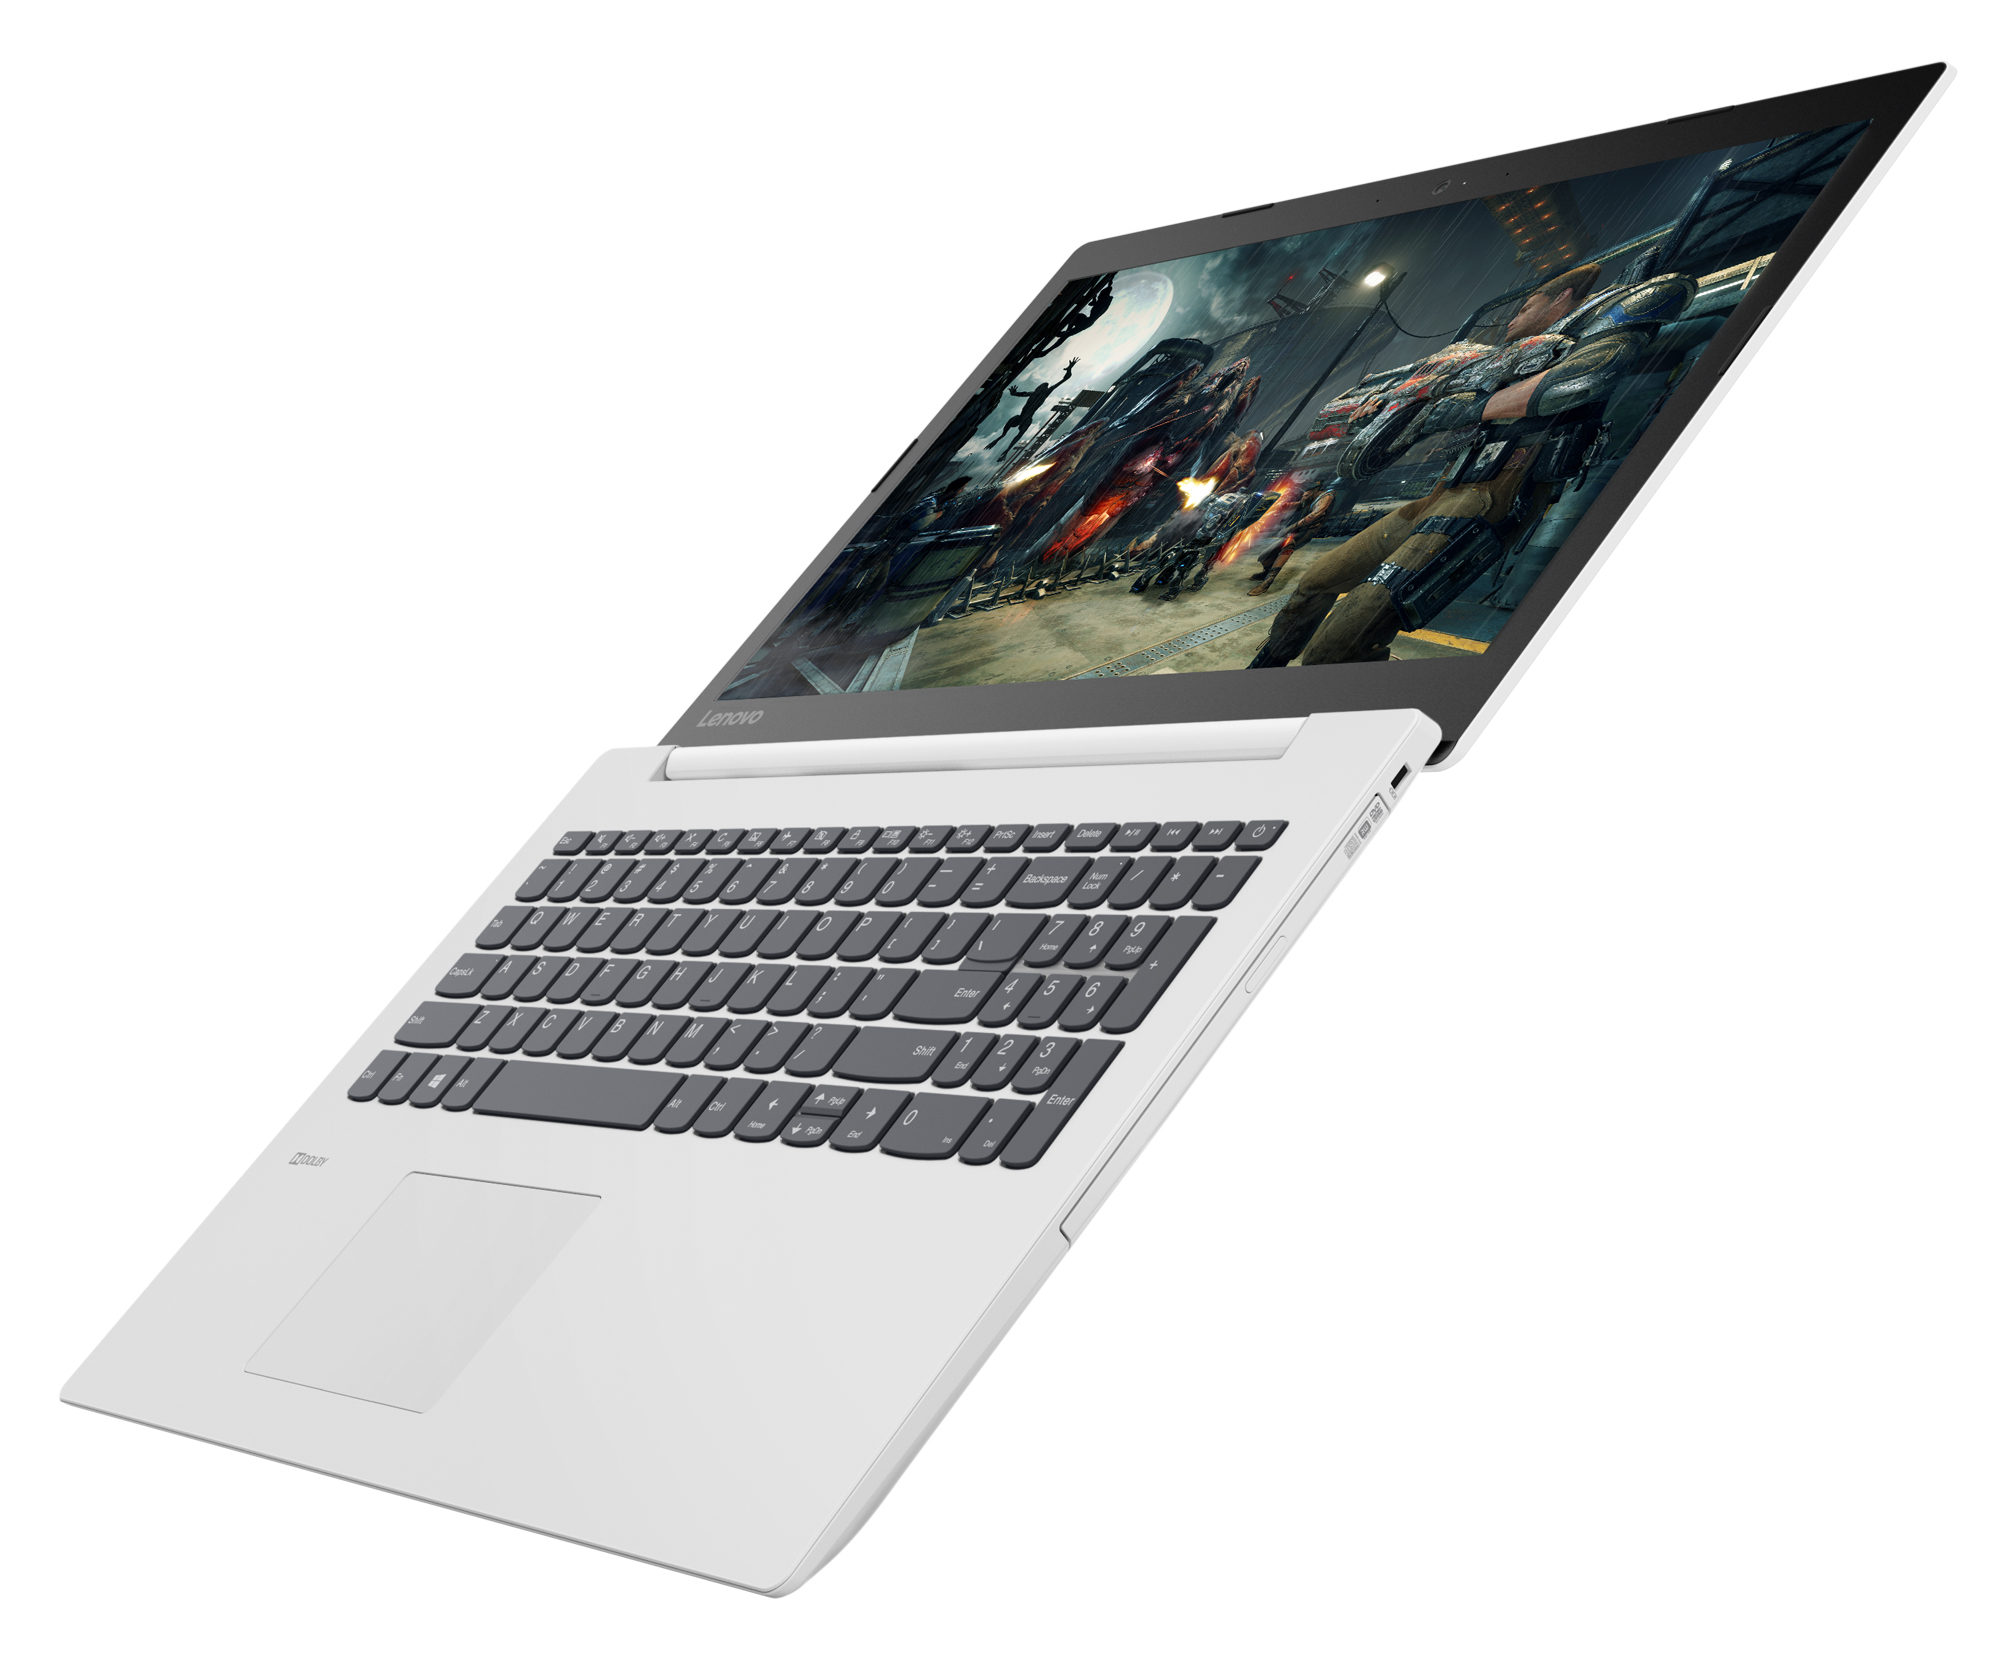 Фото  Ноутбук Lenovo ideapad 330-15 Blizzard White (81DE02ETRA)